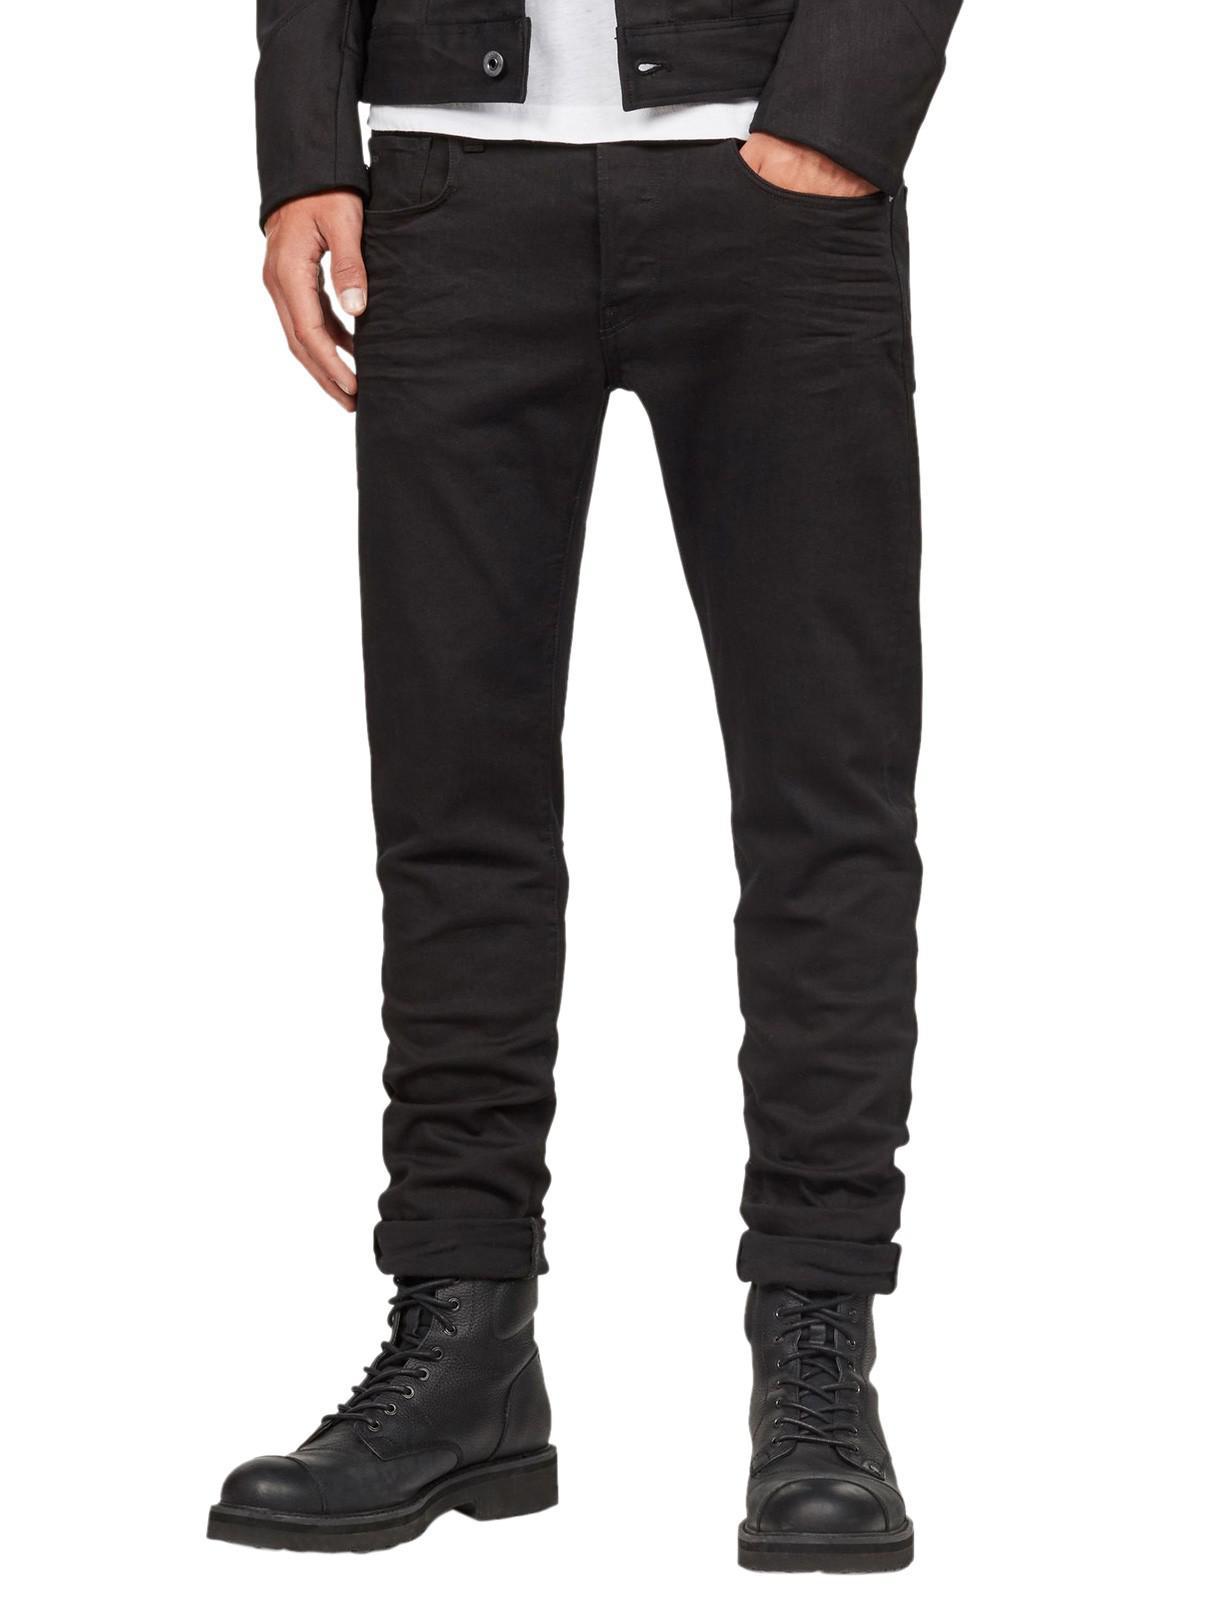 773e76a40ba6 G-Star RAW Black 3301 Slim Jeans in Black for Men - Lyst